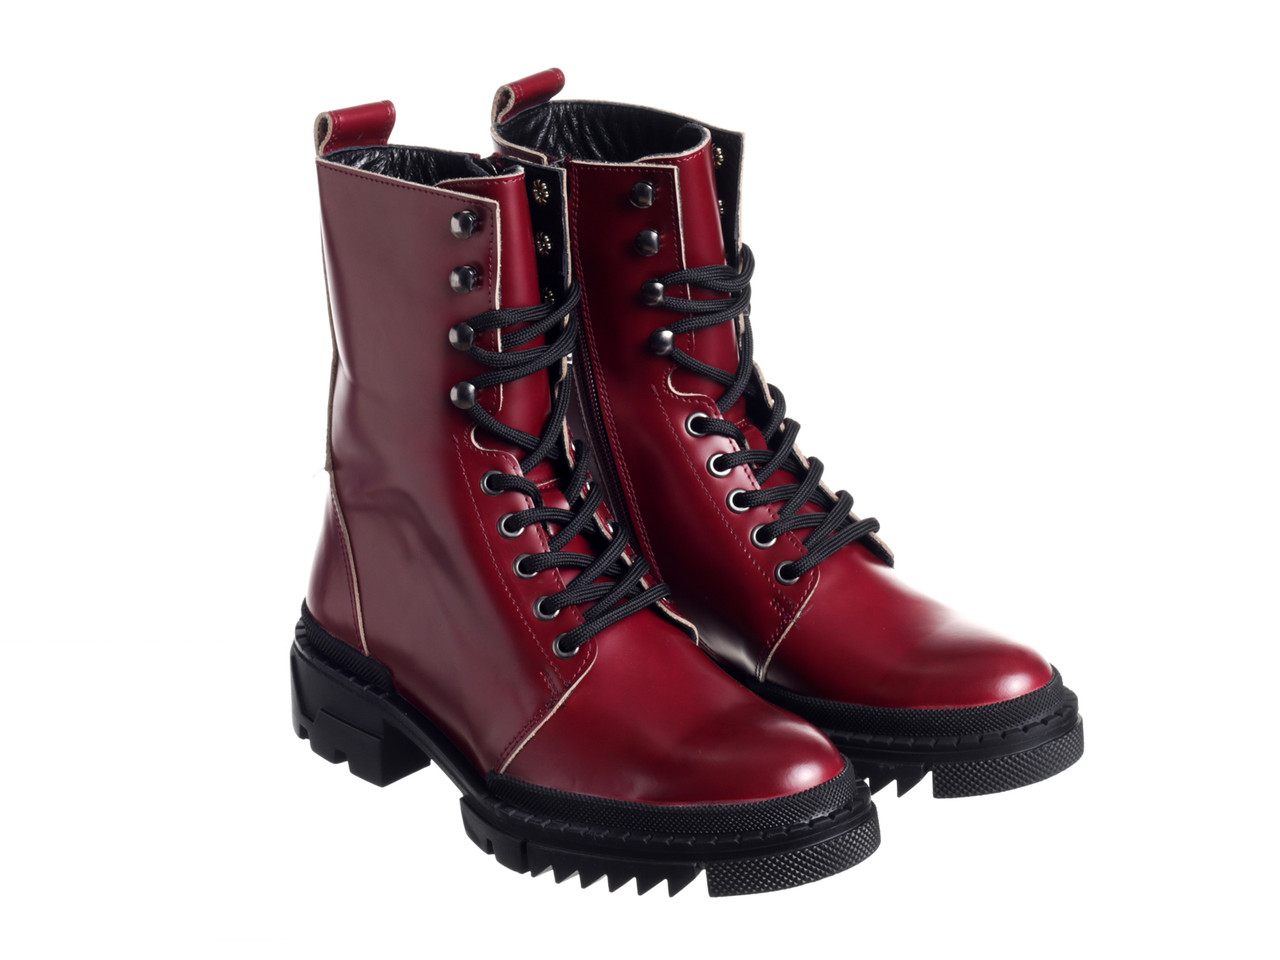 Ботинки Etor 6760-7449-2-201 бордо, фото 1